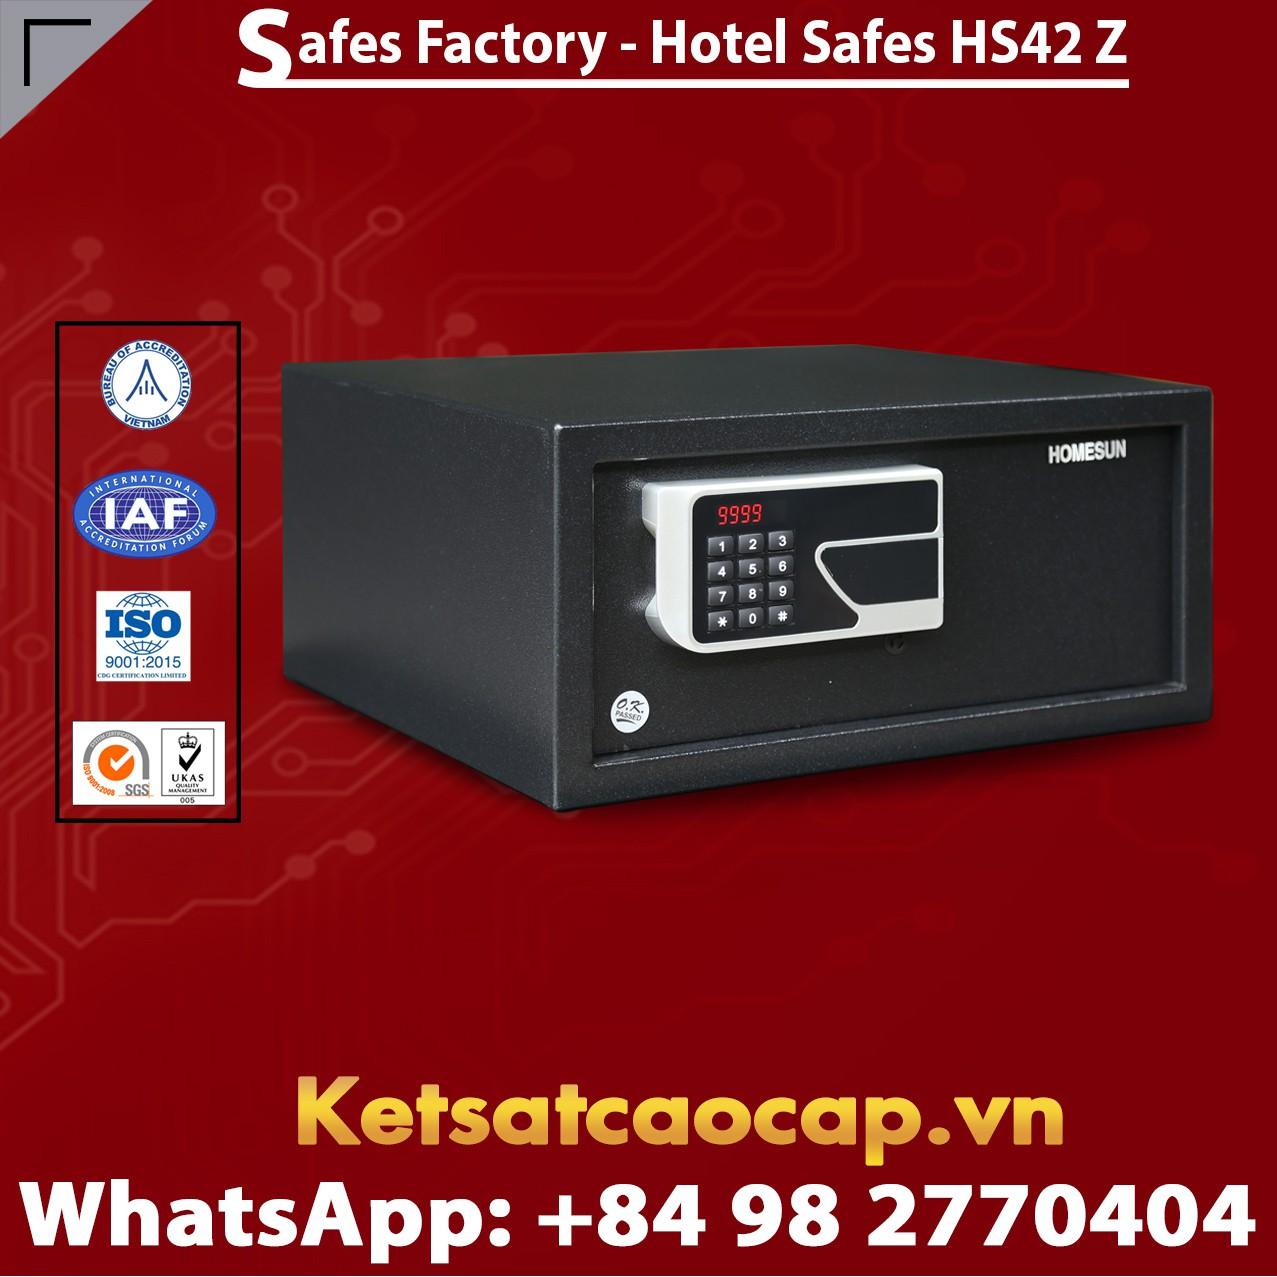 Hotel Safes HOMESUN HS42 Z